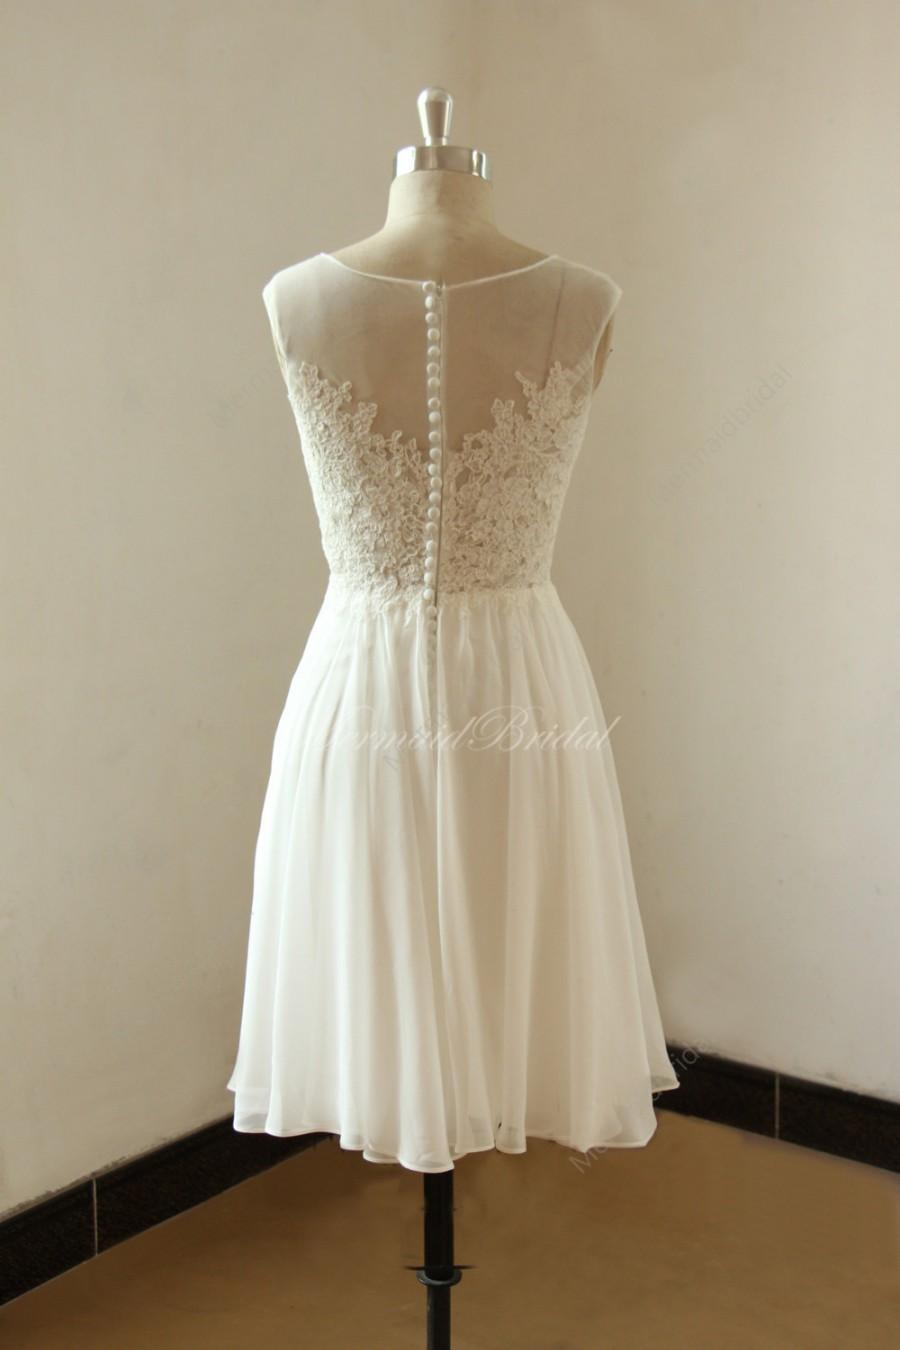 Ivory Short Knee Length Lace Chiffon Wedding Dress With